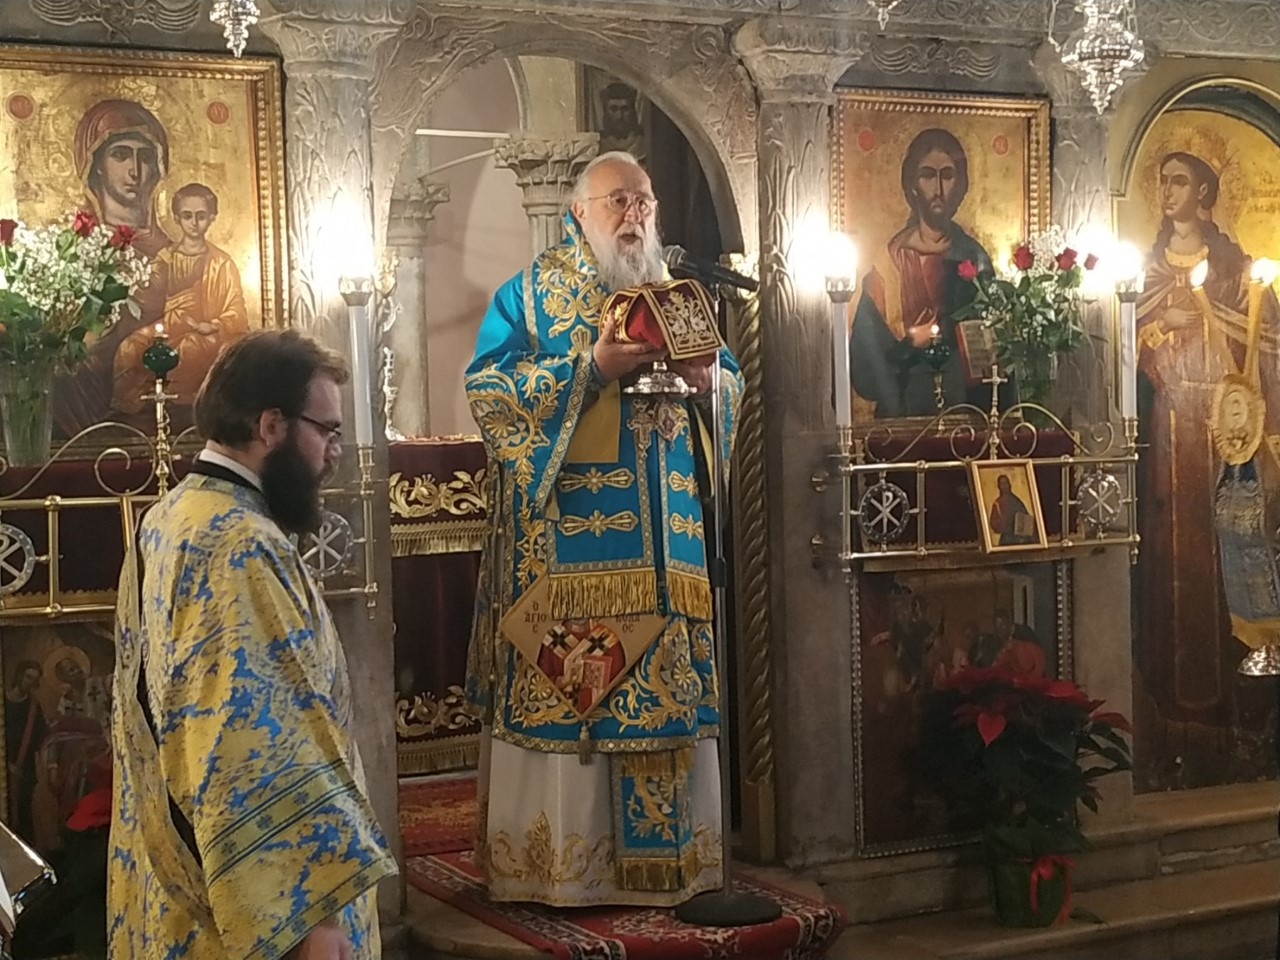 You are currently viewing Κερκύρας Νεκτάριος:  Τραγική ειρωνεία οι άρχοντες να εμποδίζουν τον λαό να τιμήσει τους Αγίους!